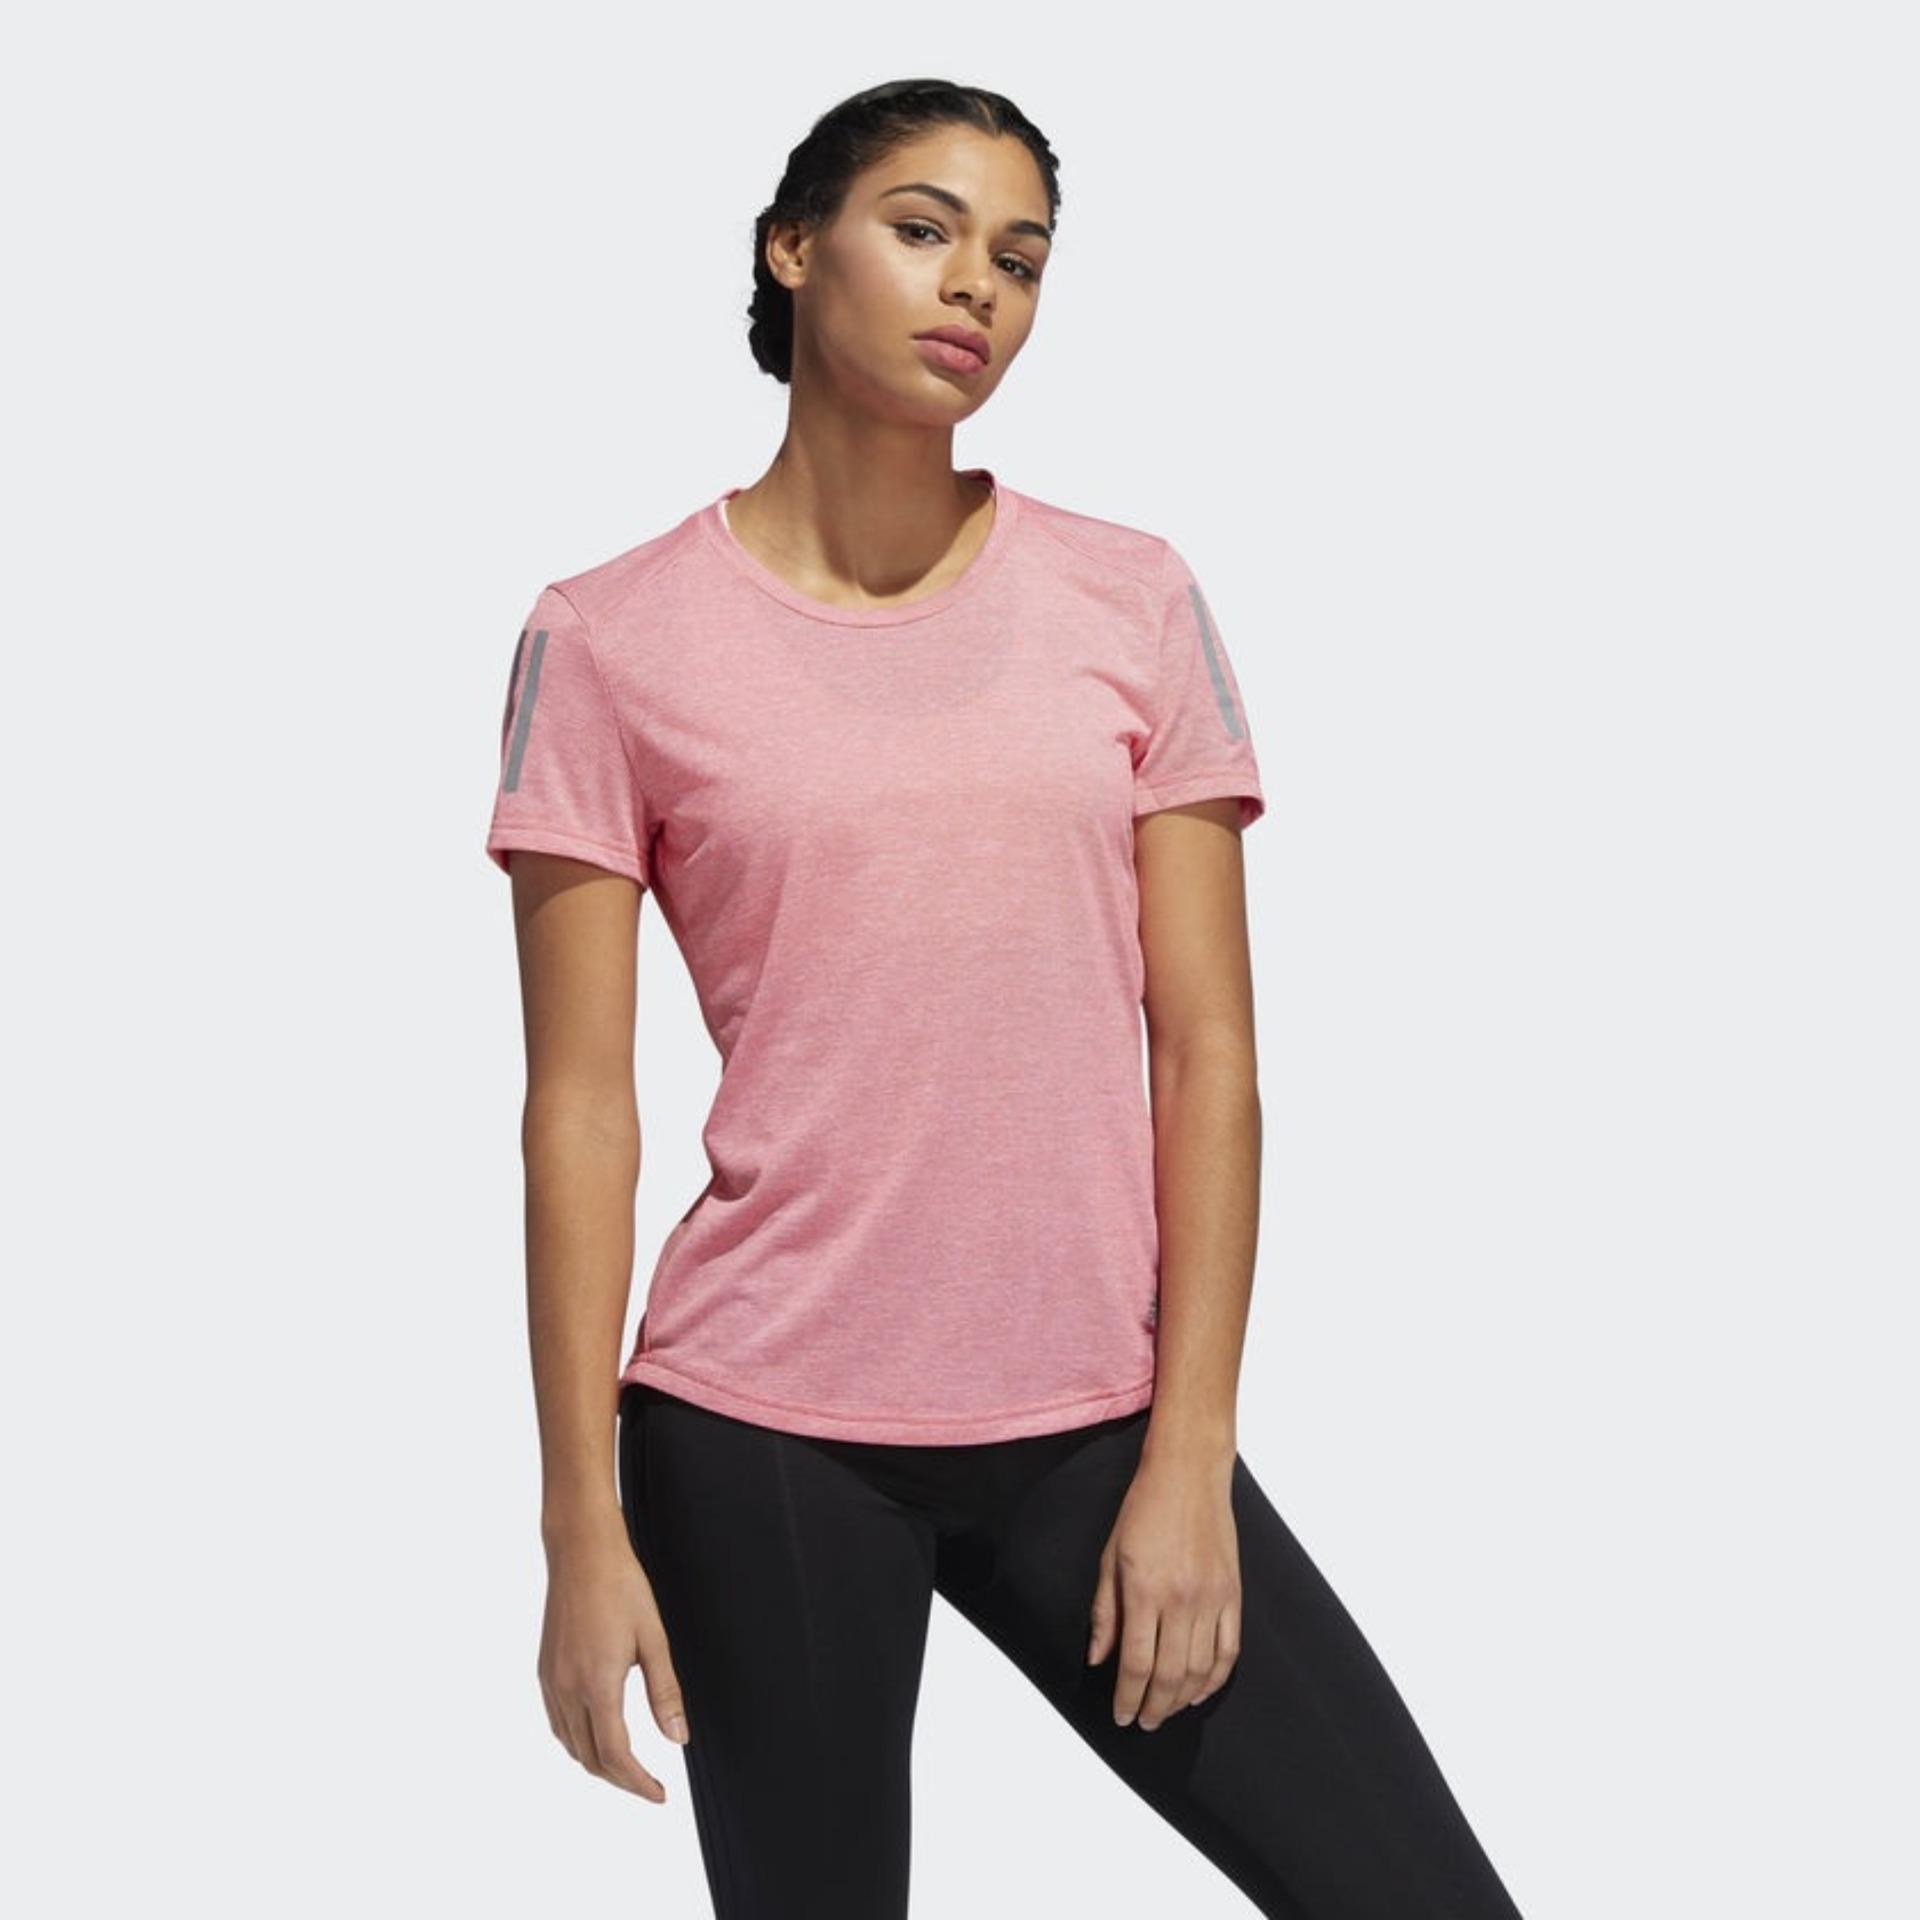 sweat-wicking T-shirt